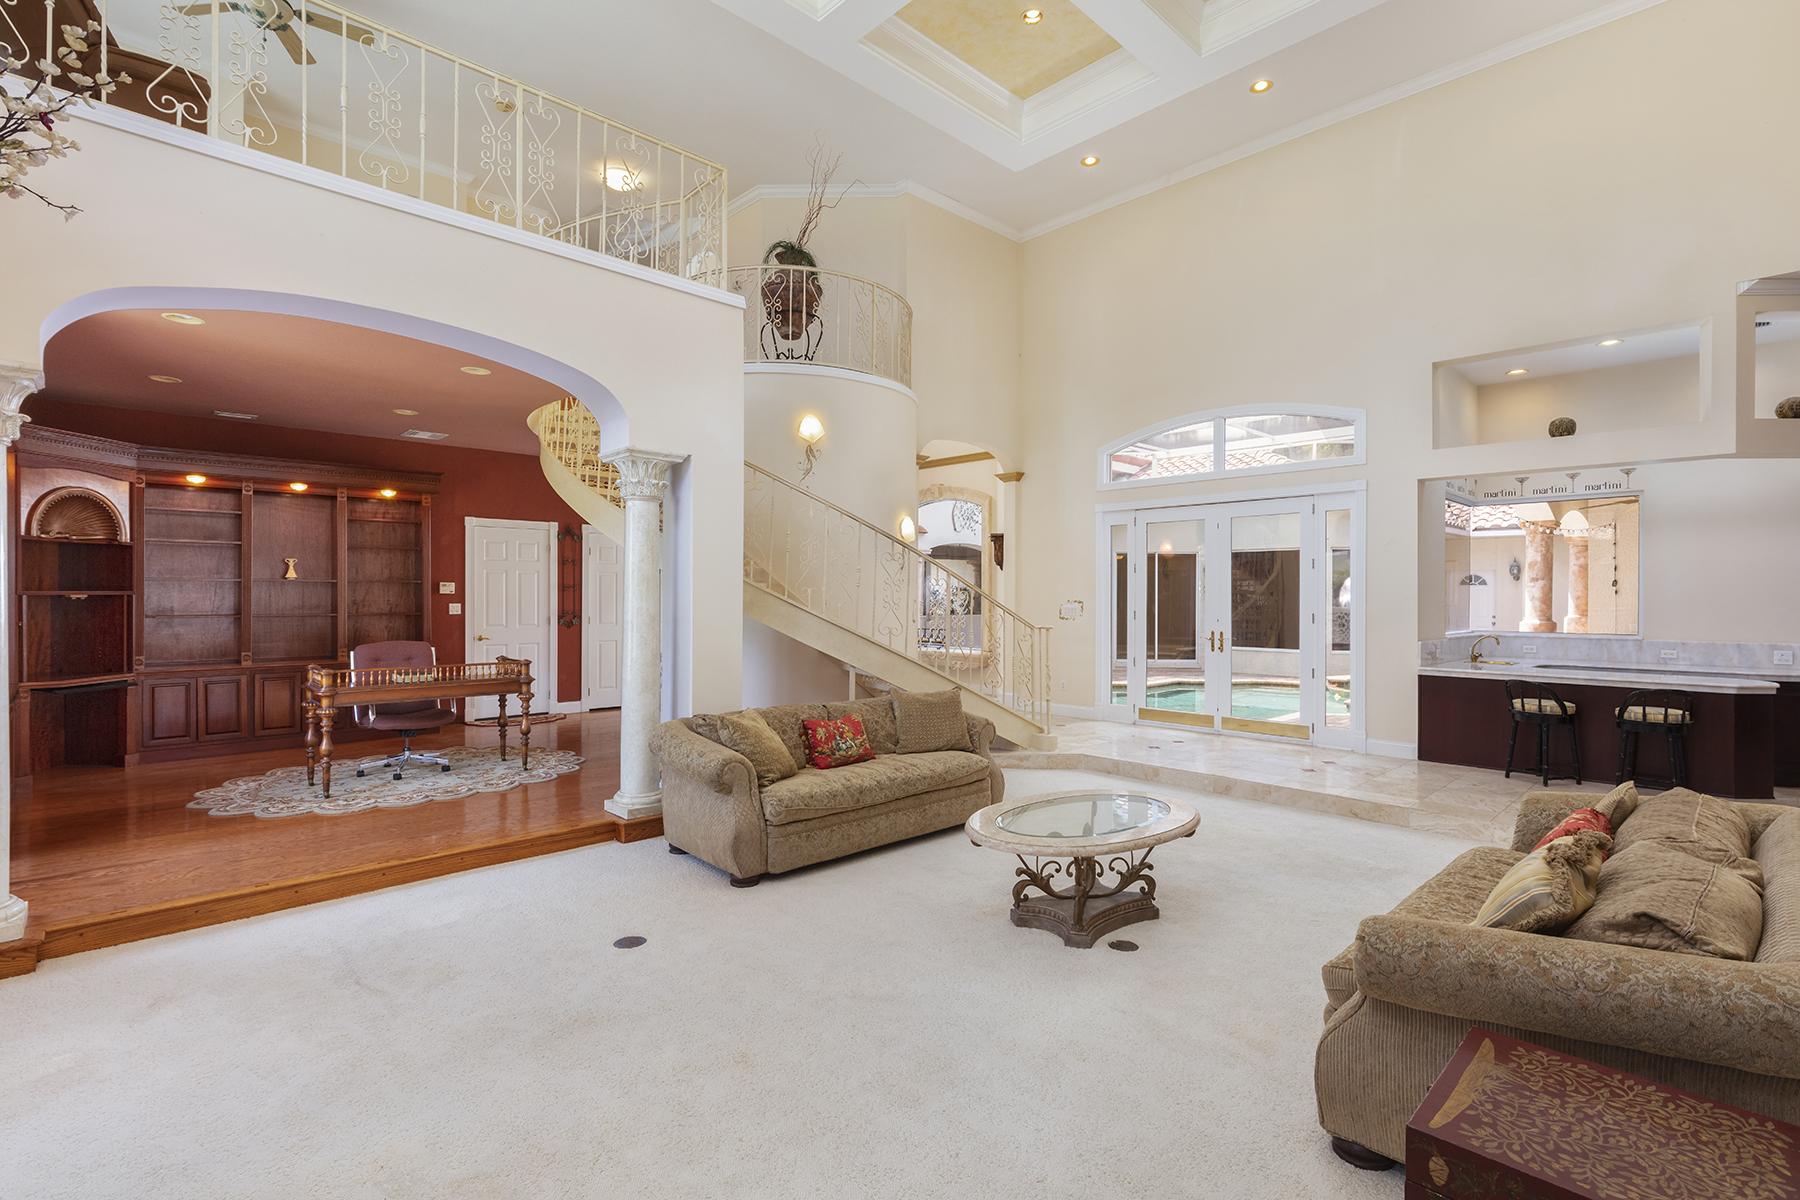 single family homes for Active at ORLANDO - TAVARES 15819 Acorn Cir Tavares, Florida 32778 United States